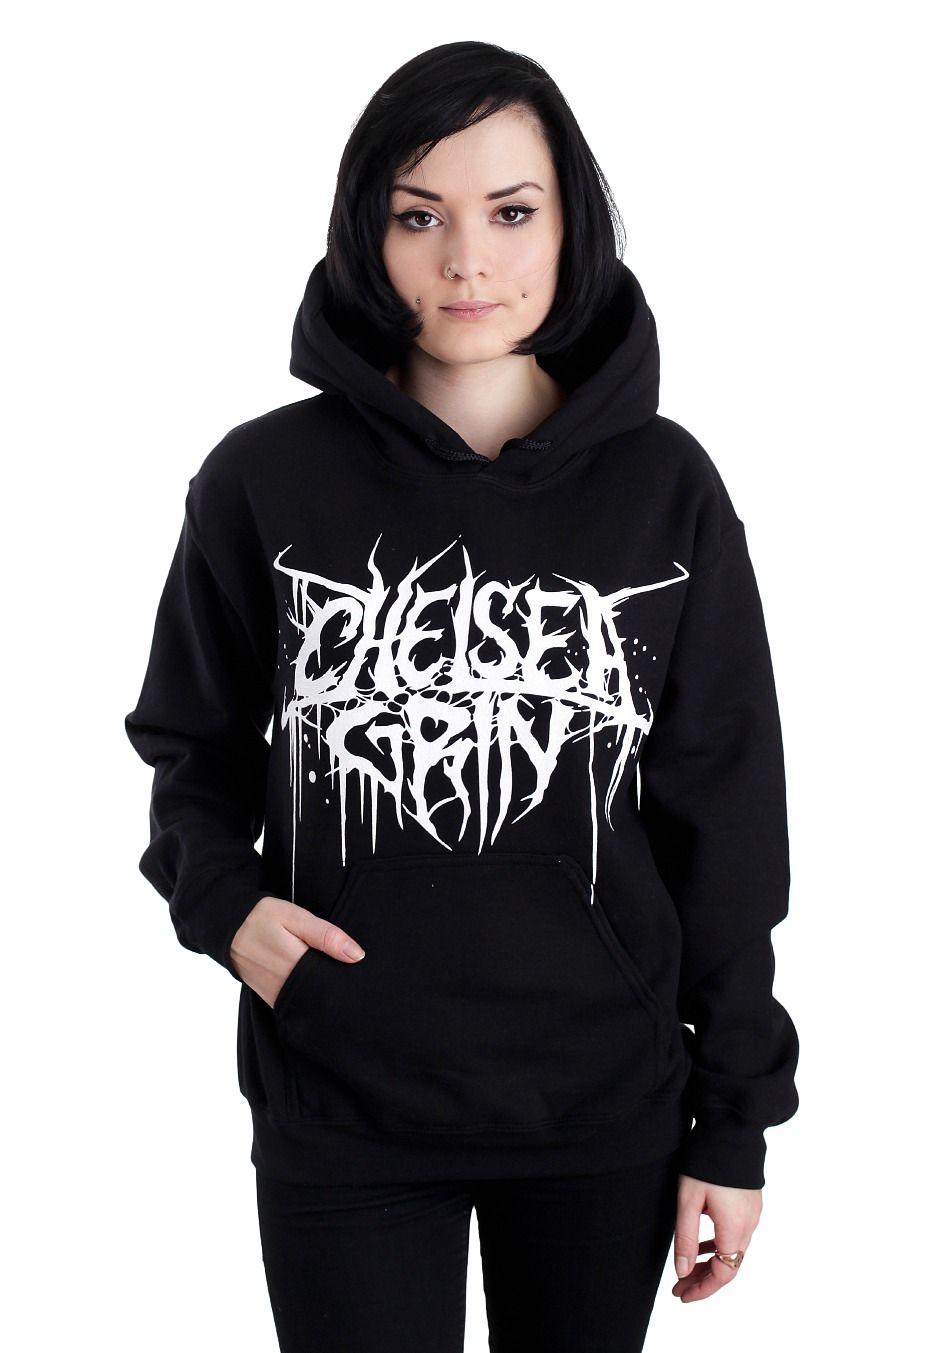 chelsea grin girl fist hoodie official deathcore merchandise online shop. Black Bedroom Furniture Sets. Home Design Ideas